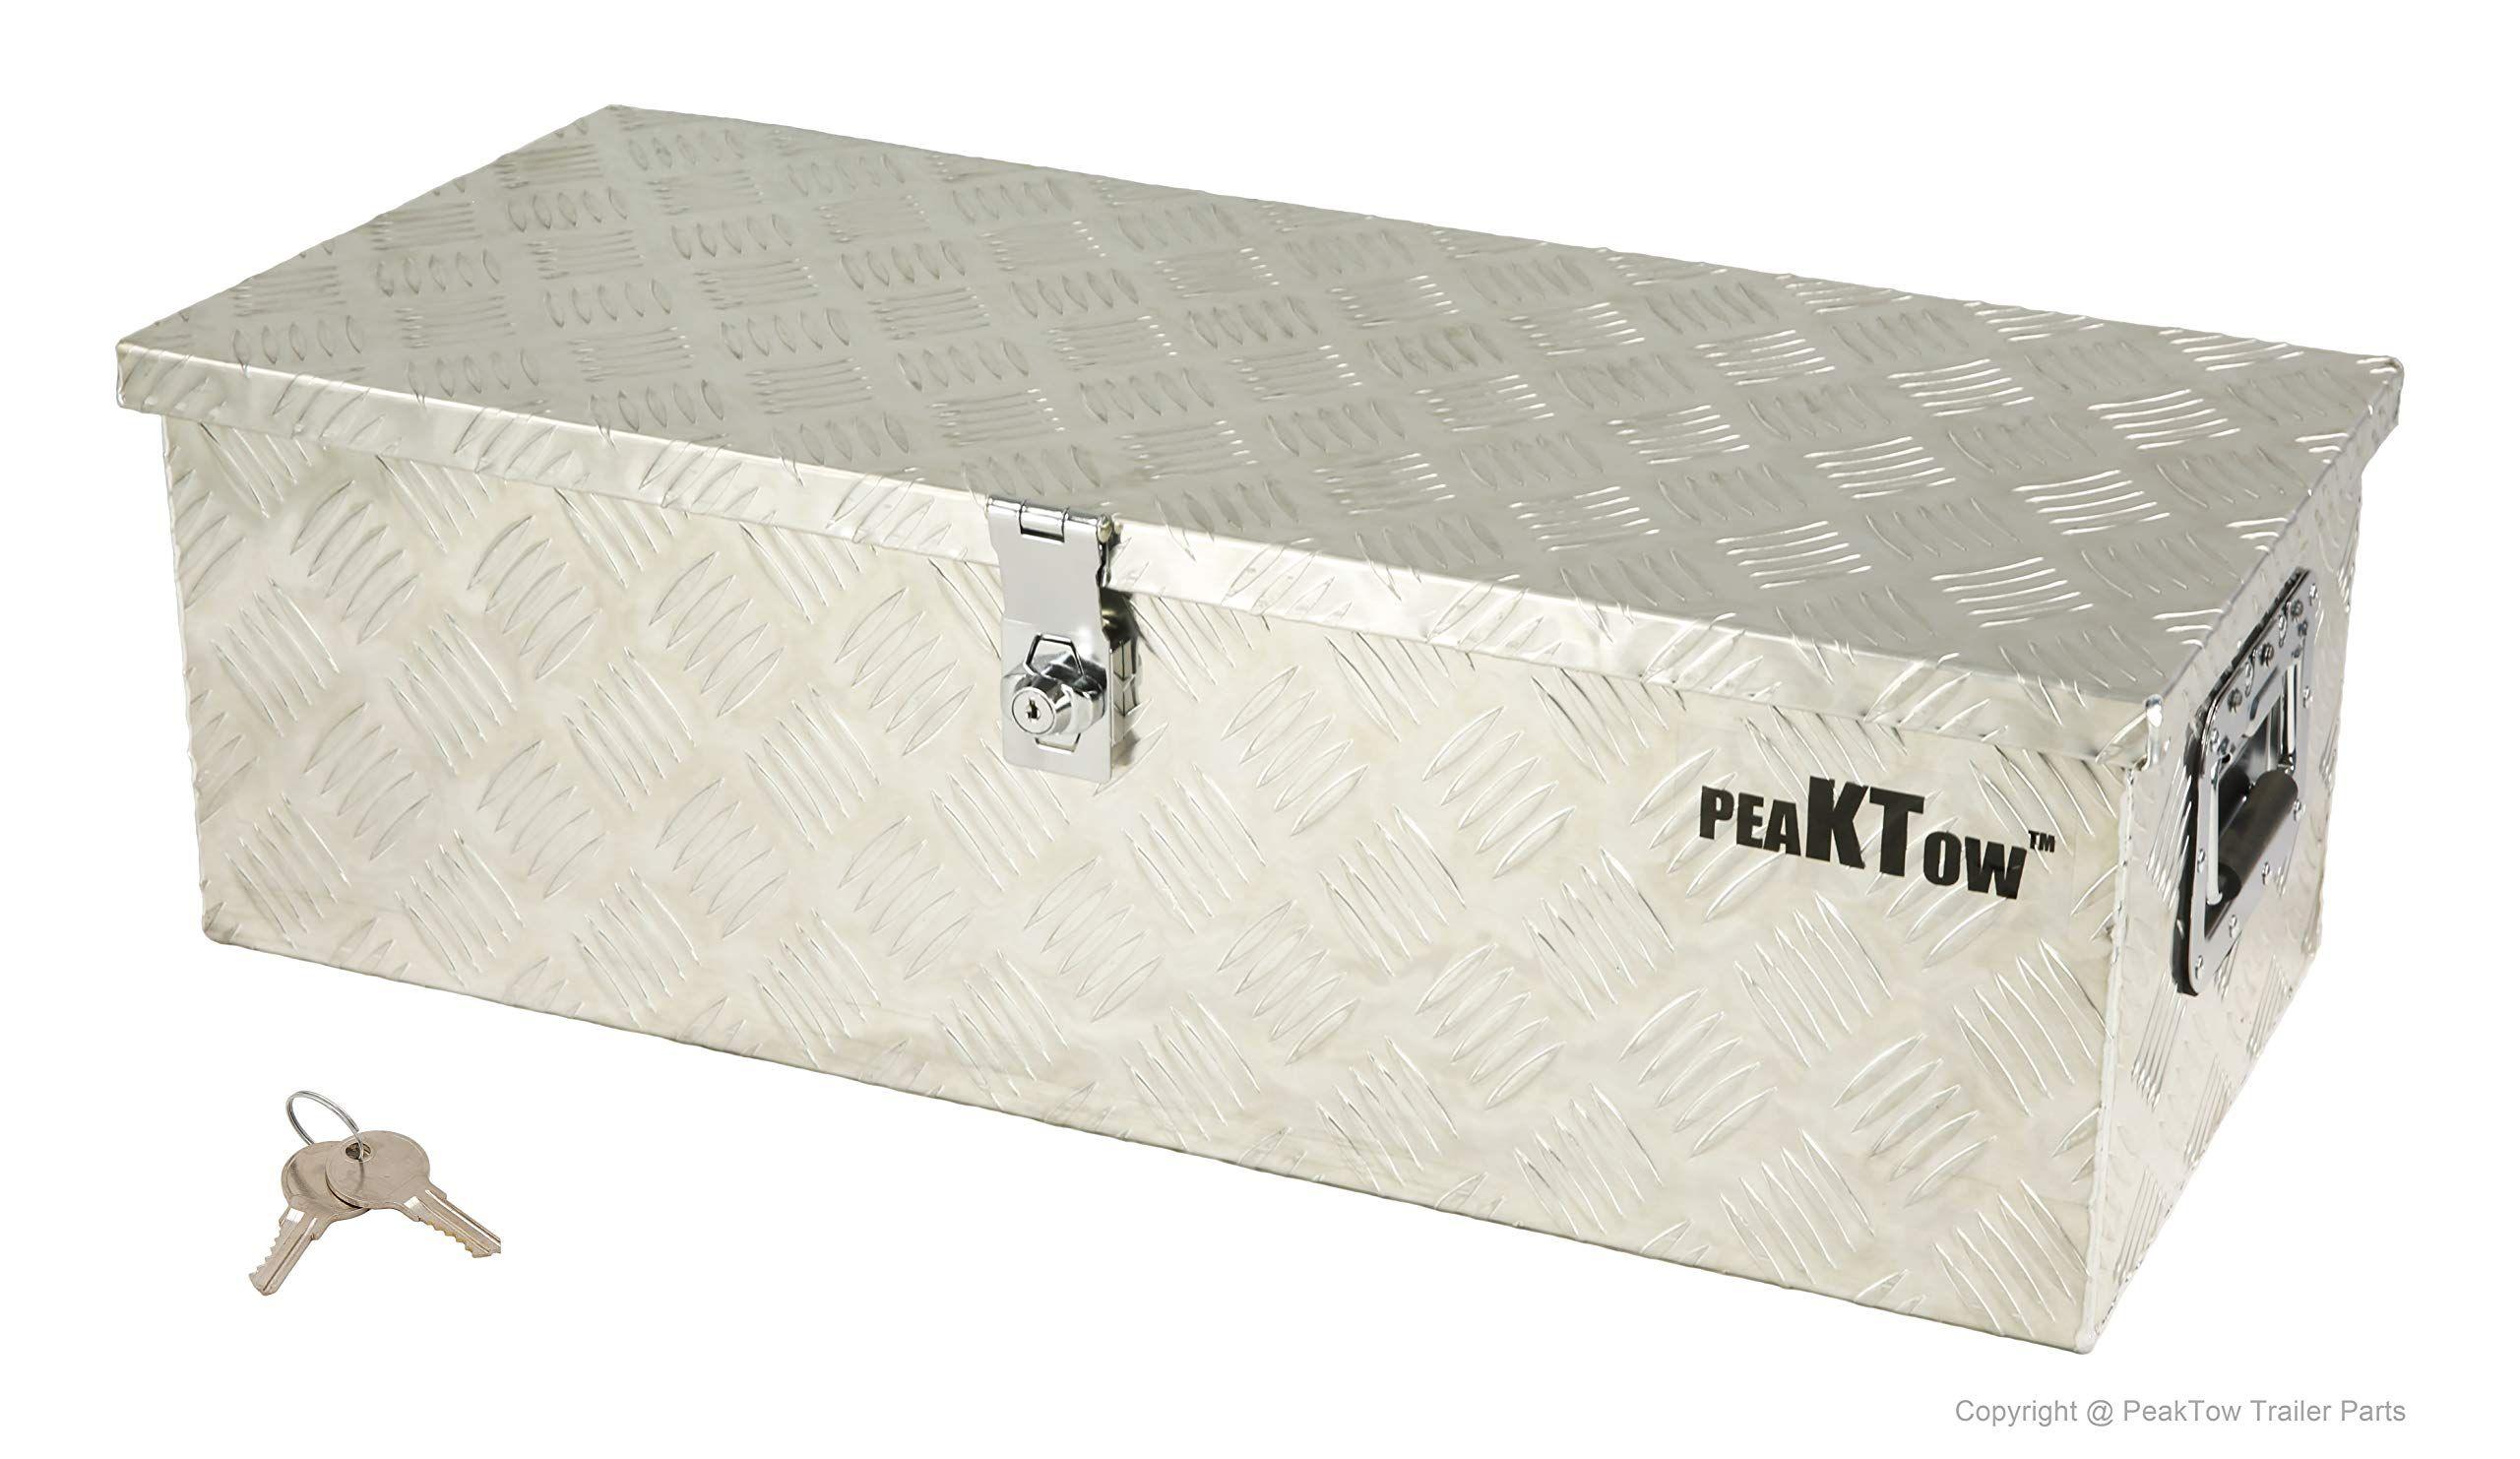 PeakTow PTB0003 Heavy Duty Aluminum 30 x 13 Inch Truck